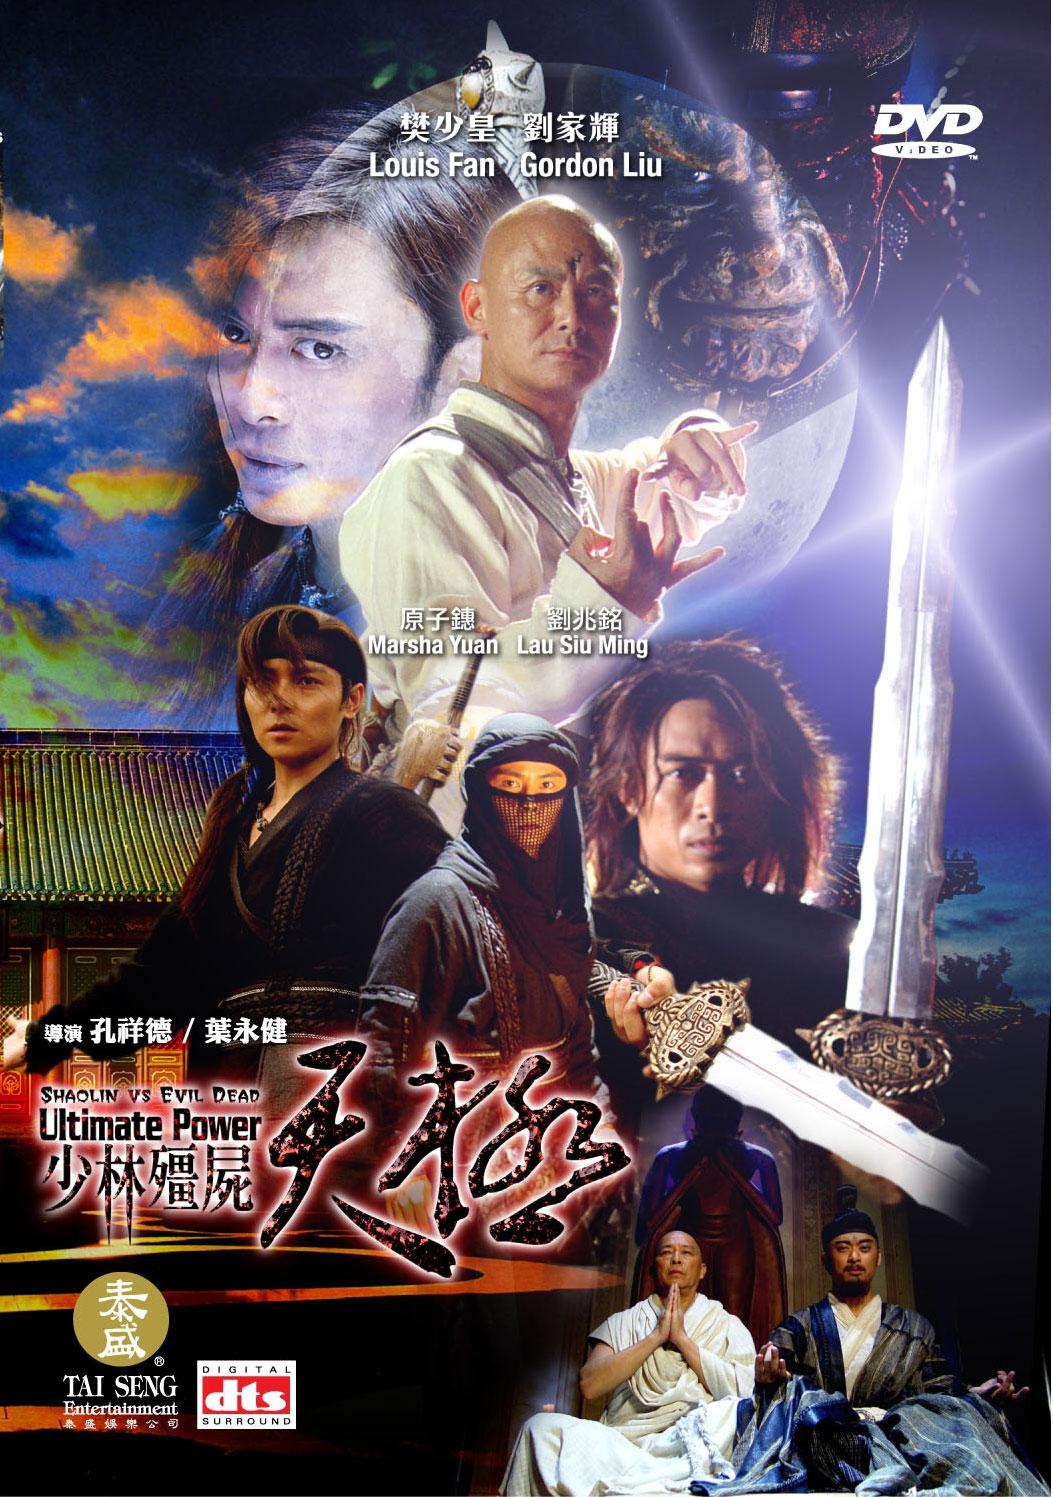 Shaolin vs. Evil Dead 2: Ultimate Power movie